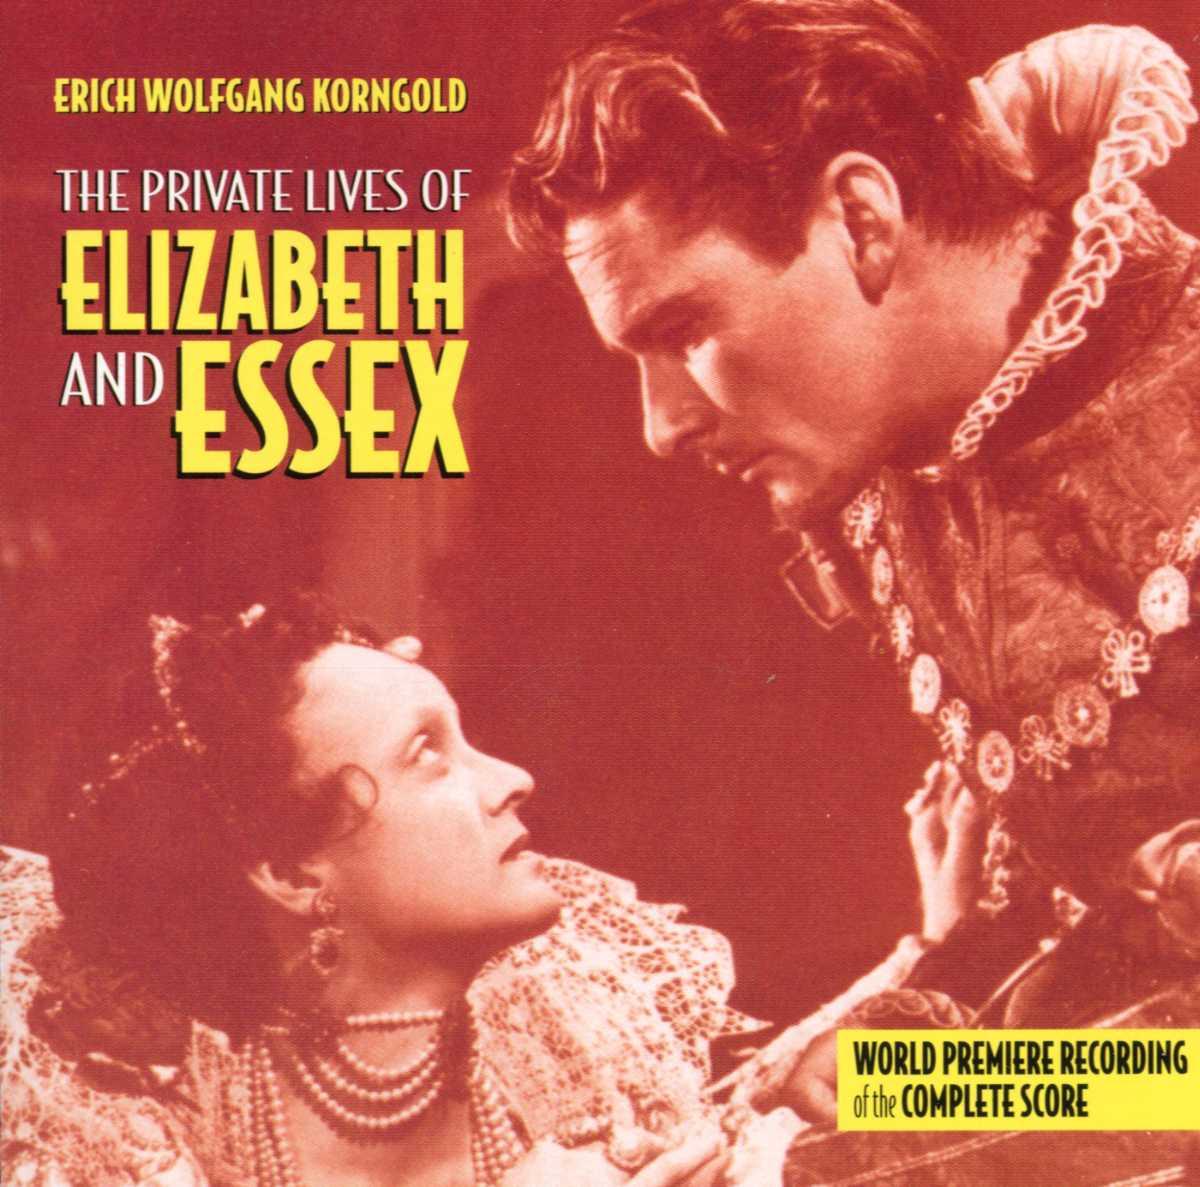 Private Lives of Elizabeth & Essex / O.s.t. - Private Lives of Elizabeth & Essex / O.s.t. - Musik - VARESE SARABANDE - 0030206569629 - March 10, 1998